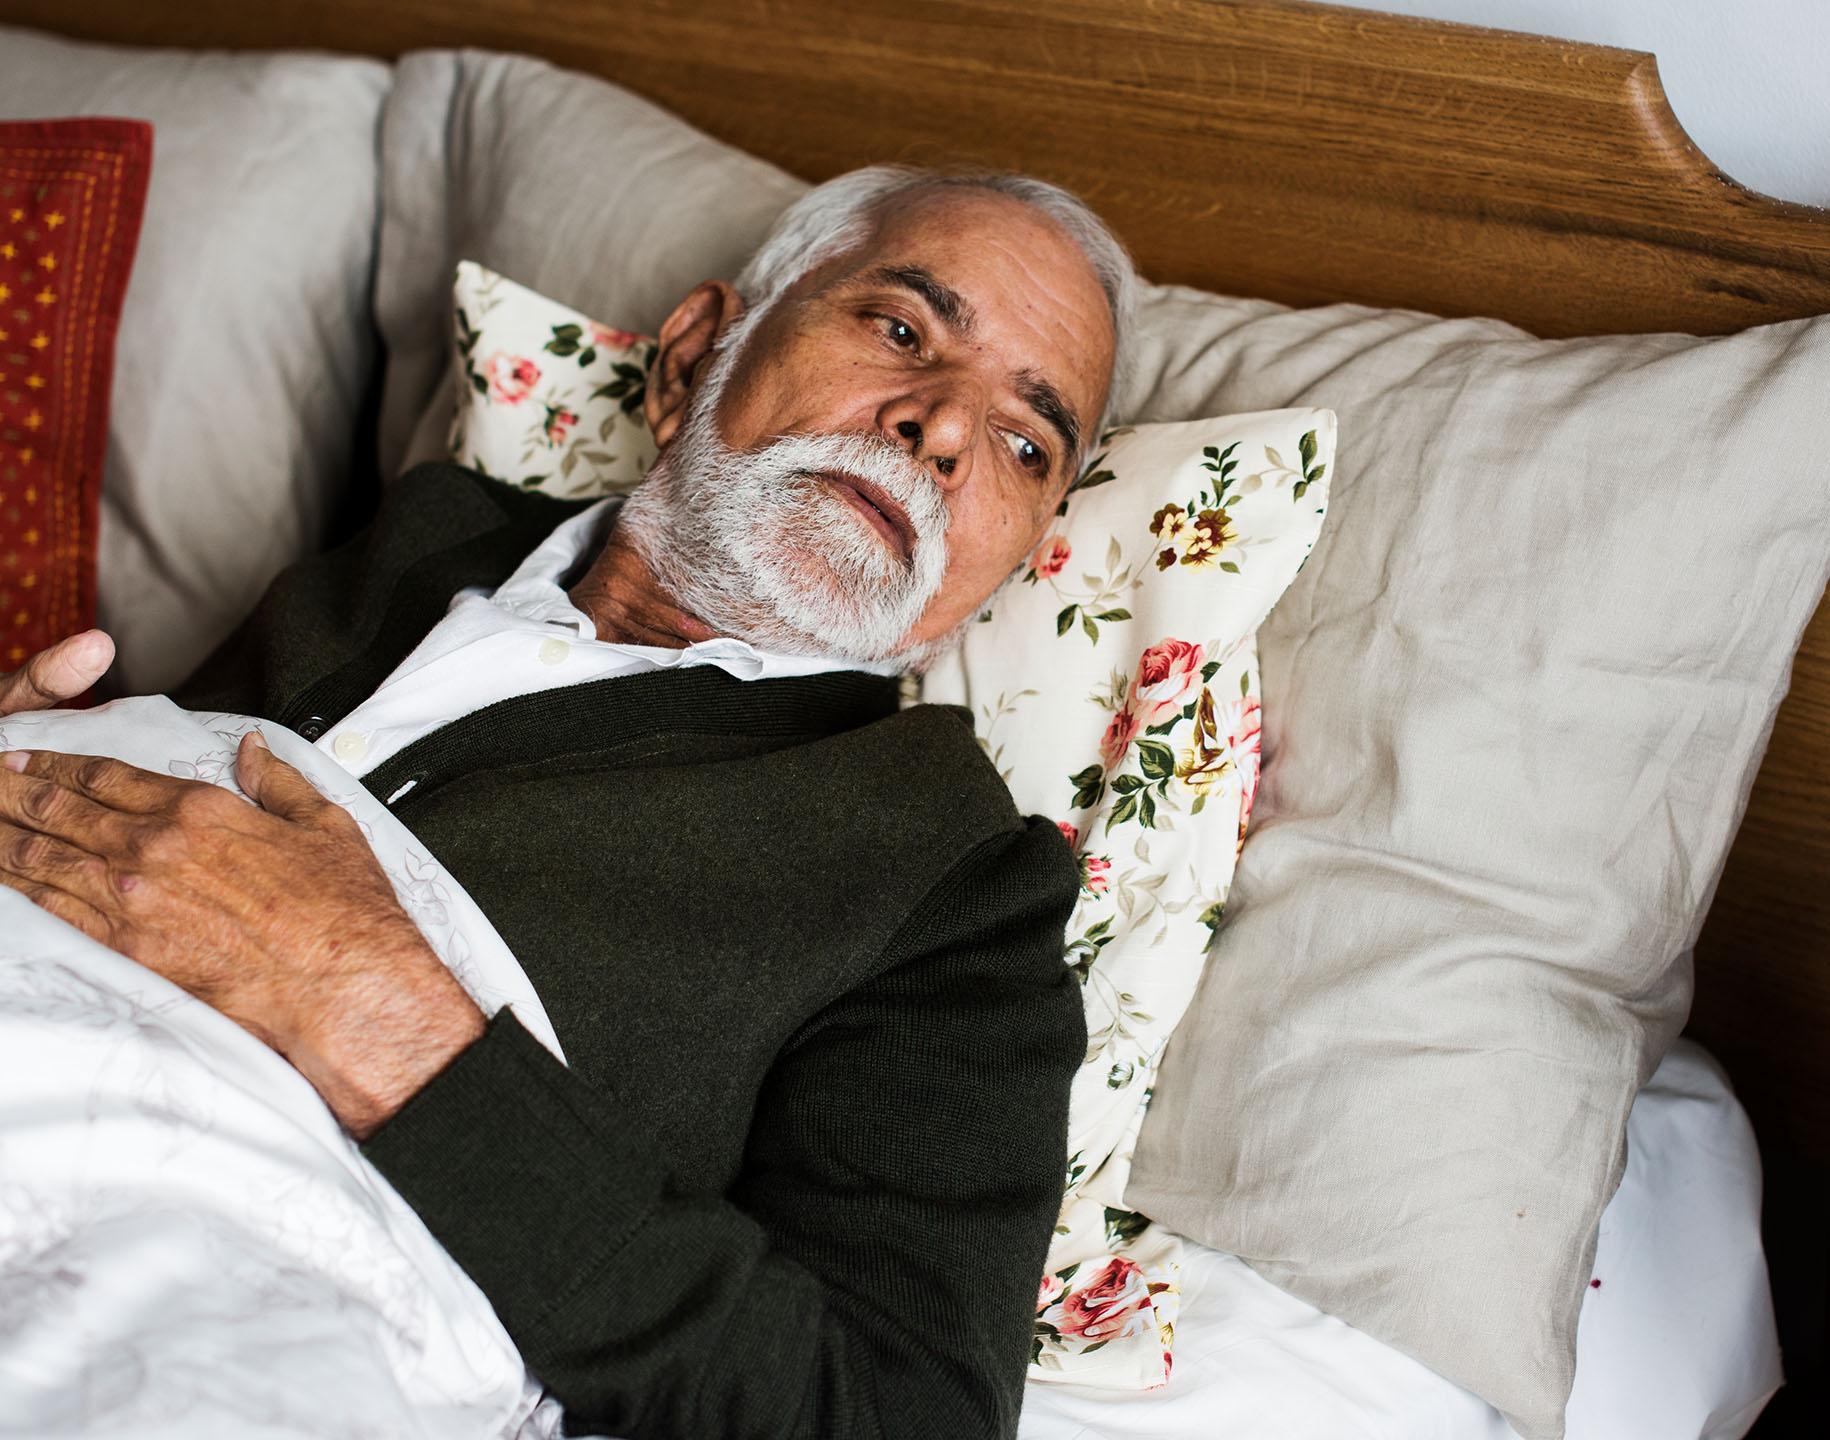 Bedsores In Nursing Homes (Updated June 2021)